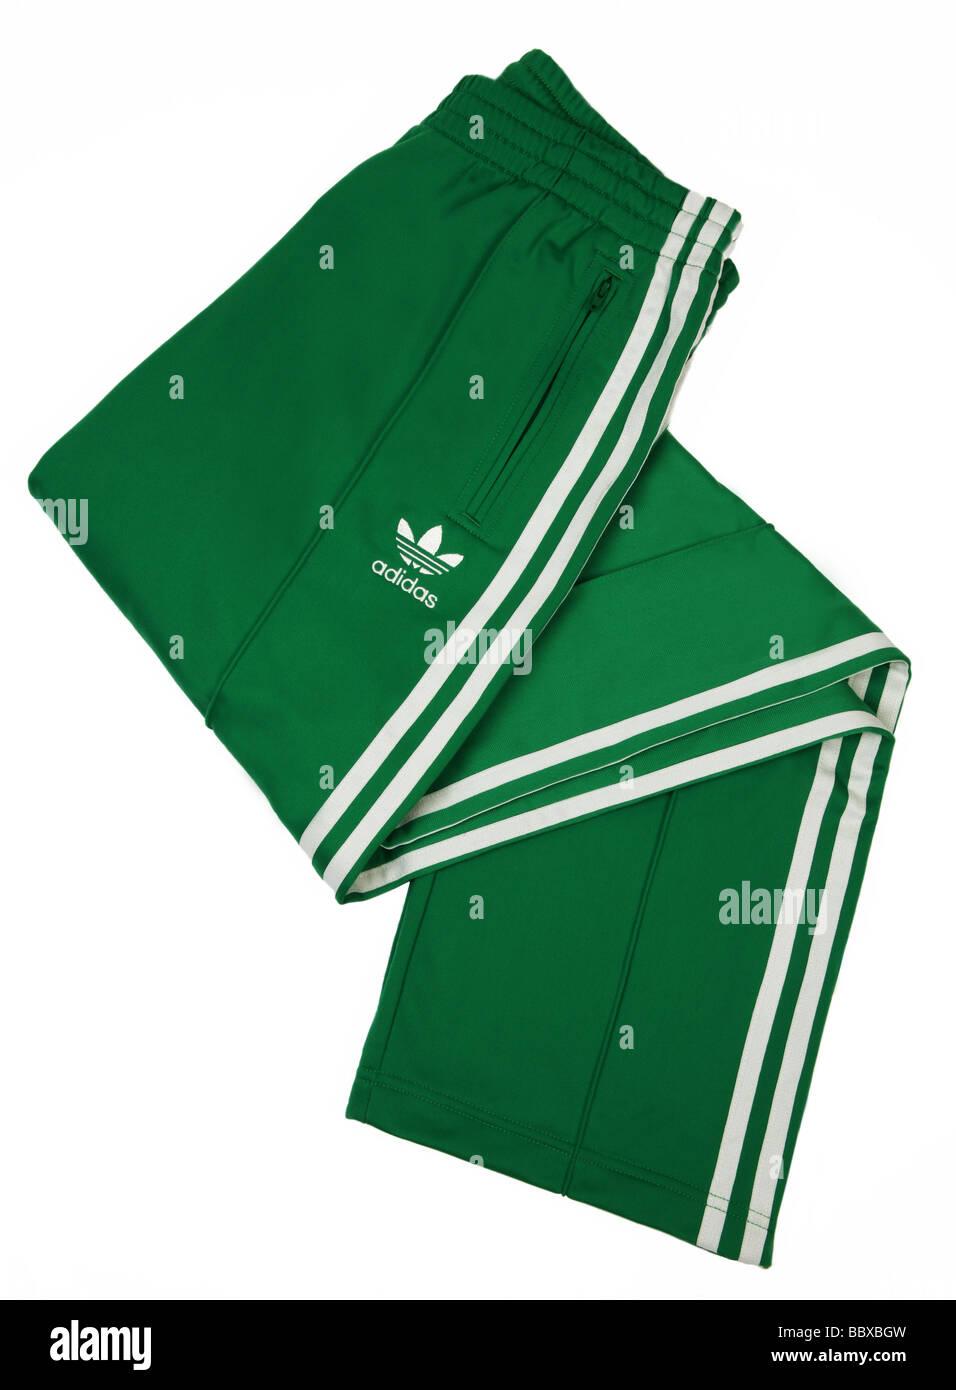 so cheap designer fashion best selling Adidas Oldschool Trainingsanzug Hose Stockfoto, Bild ...